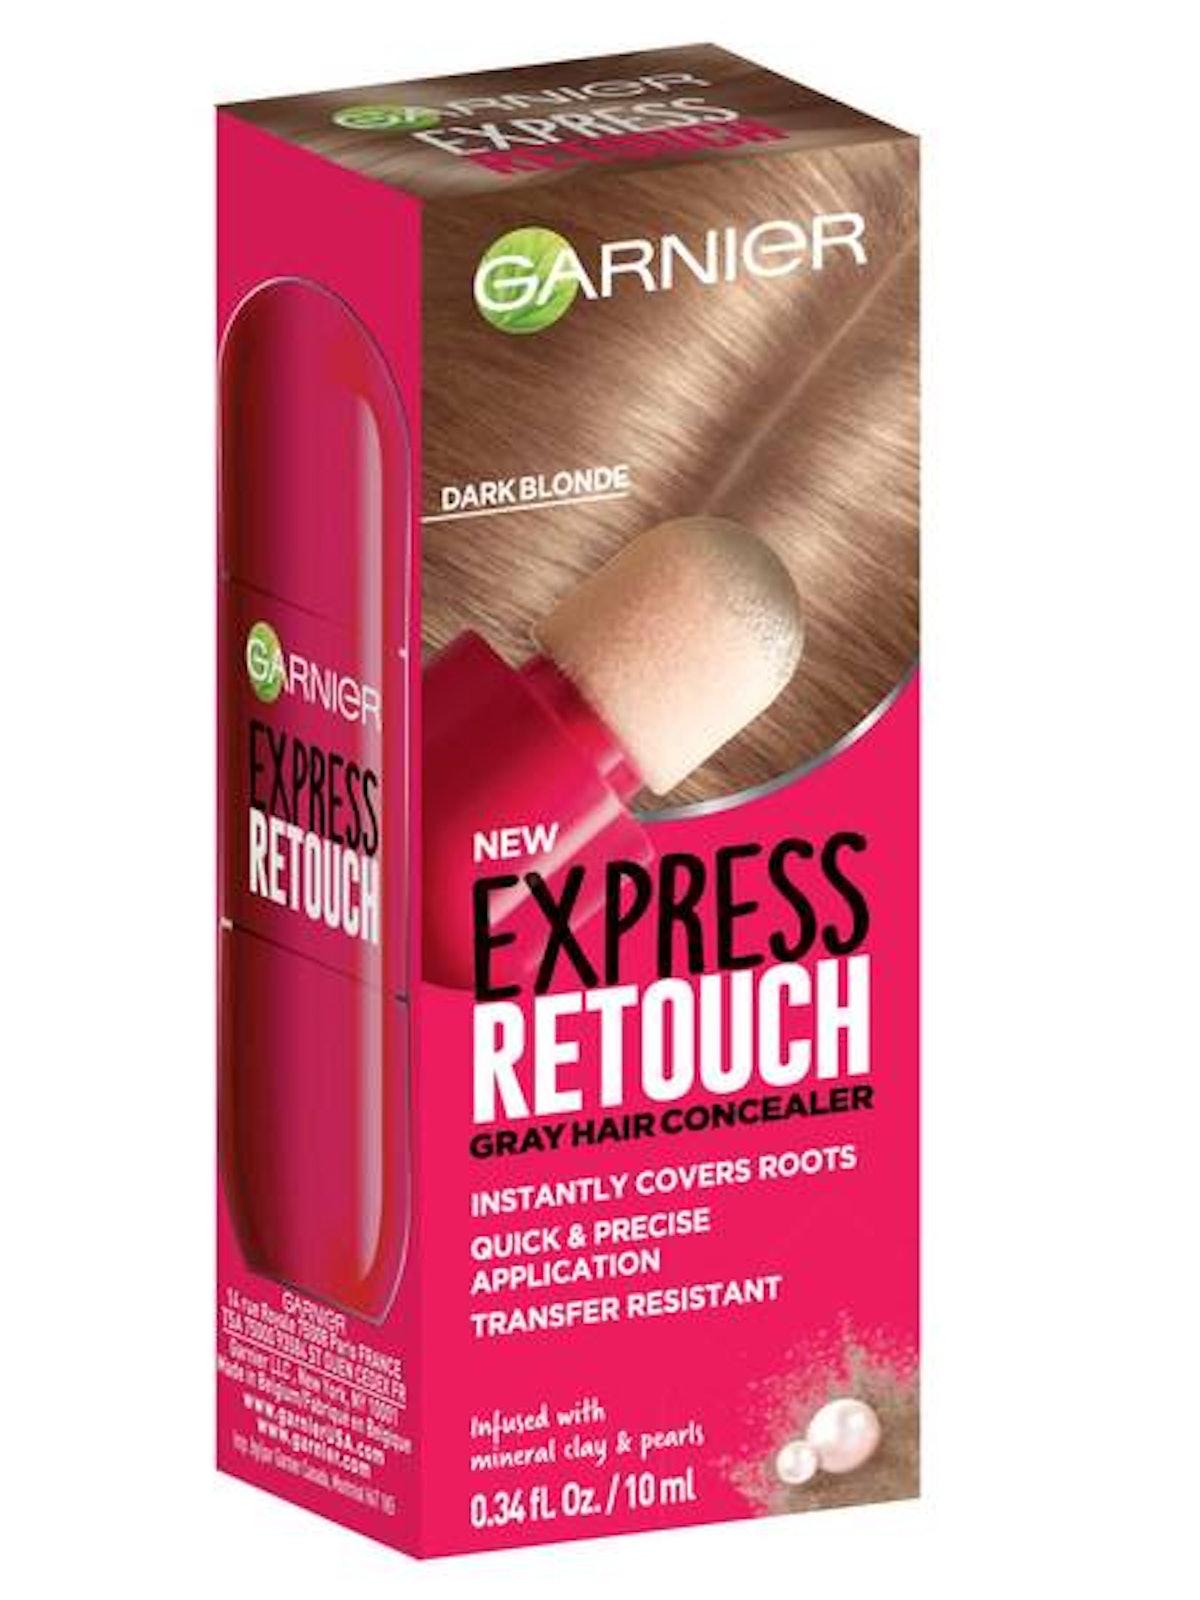 Garnier Express Retouch Root Touch-up